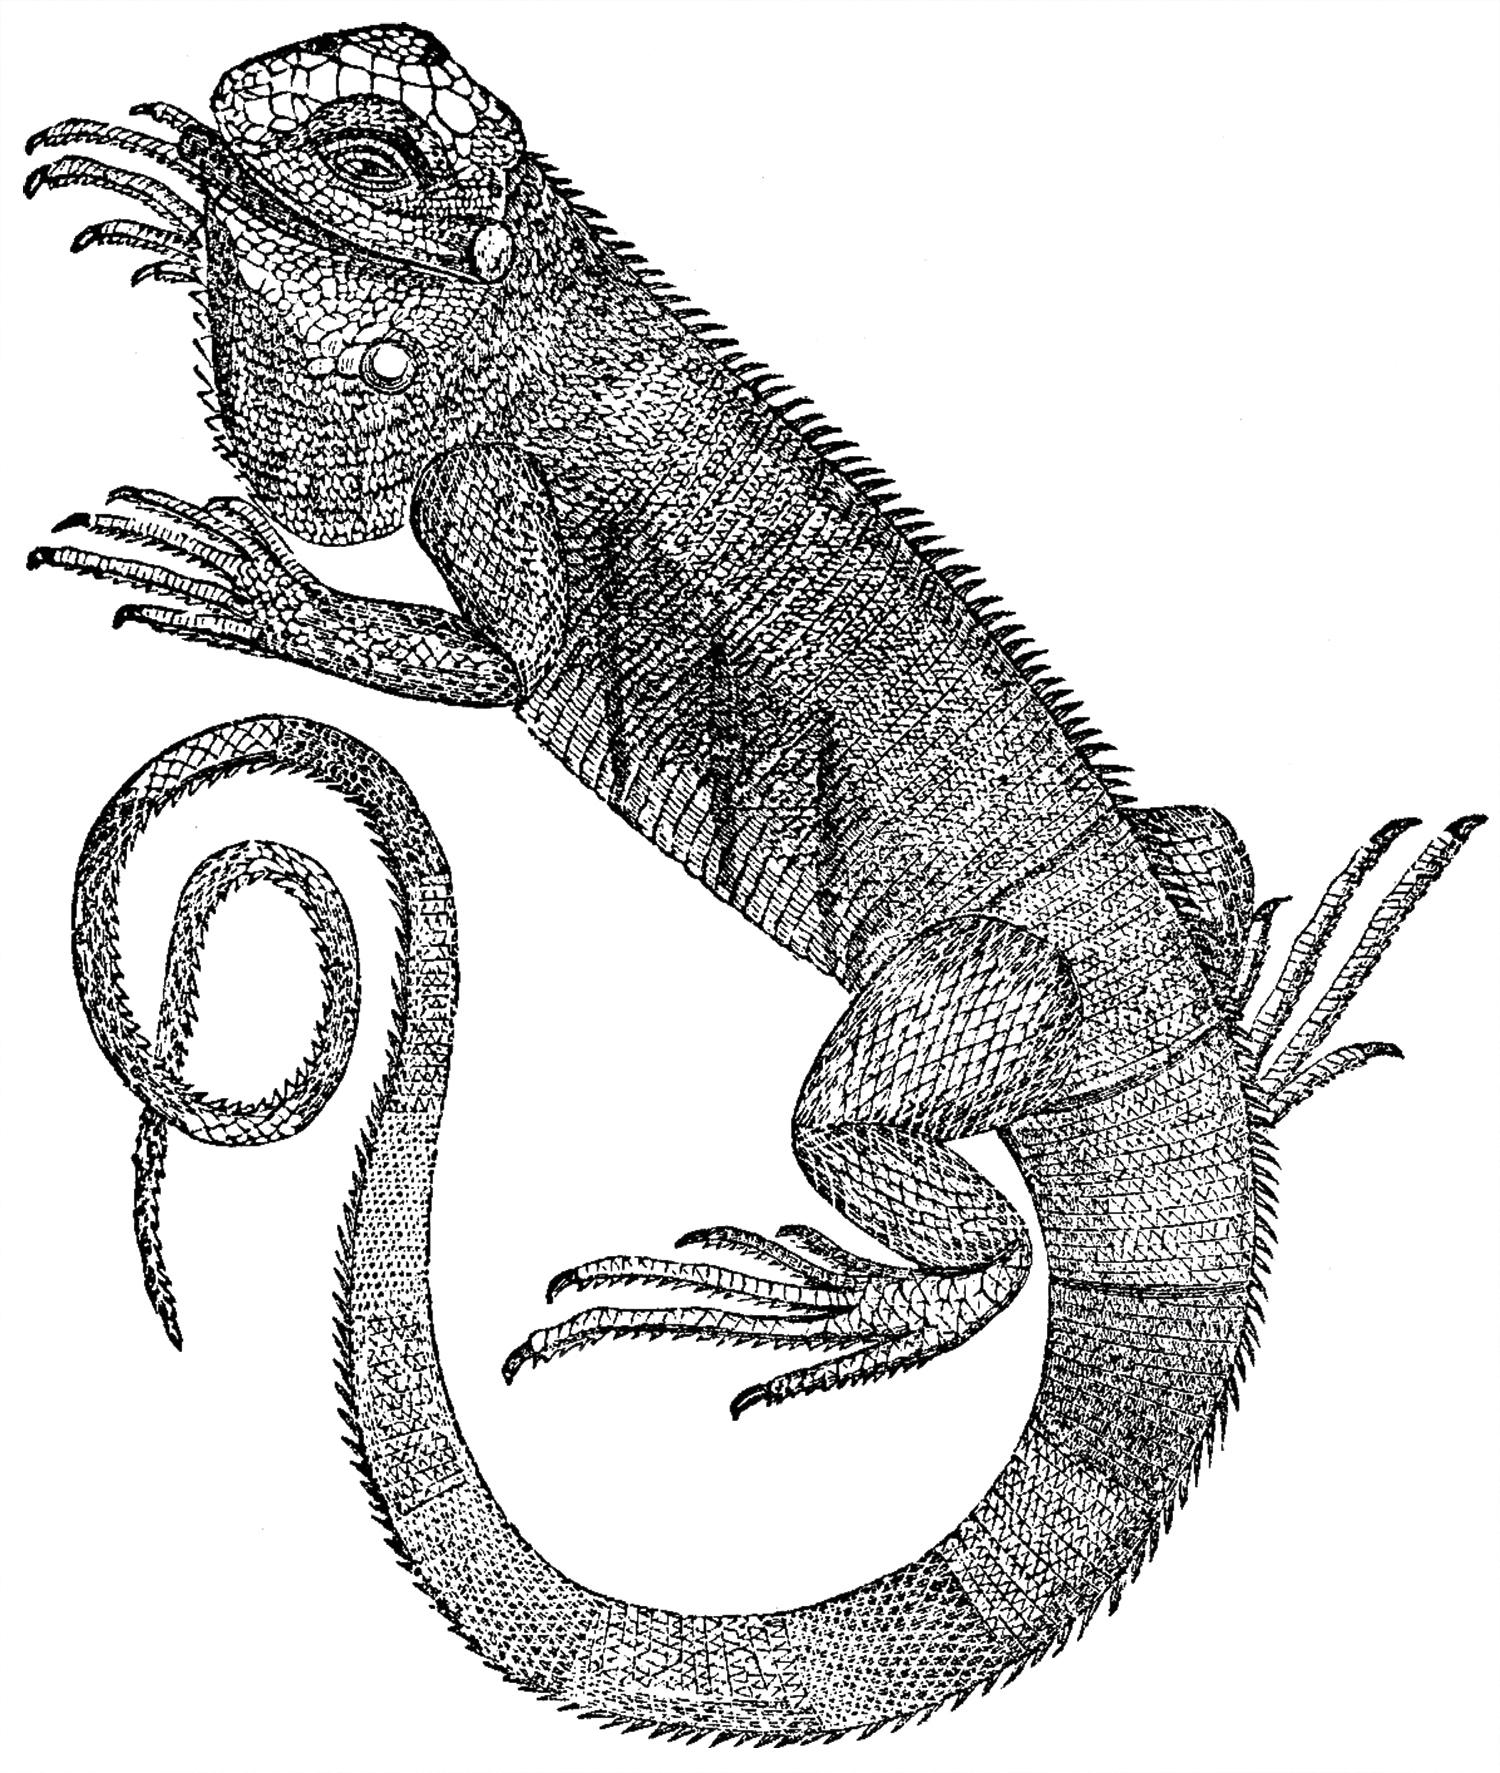 Free Iguana Clip Art - The Graphics Fairy